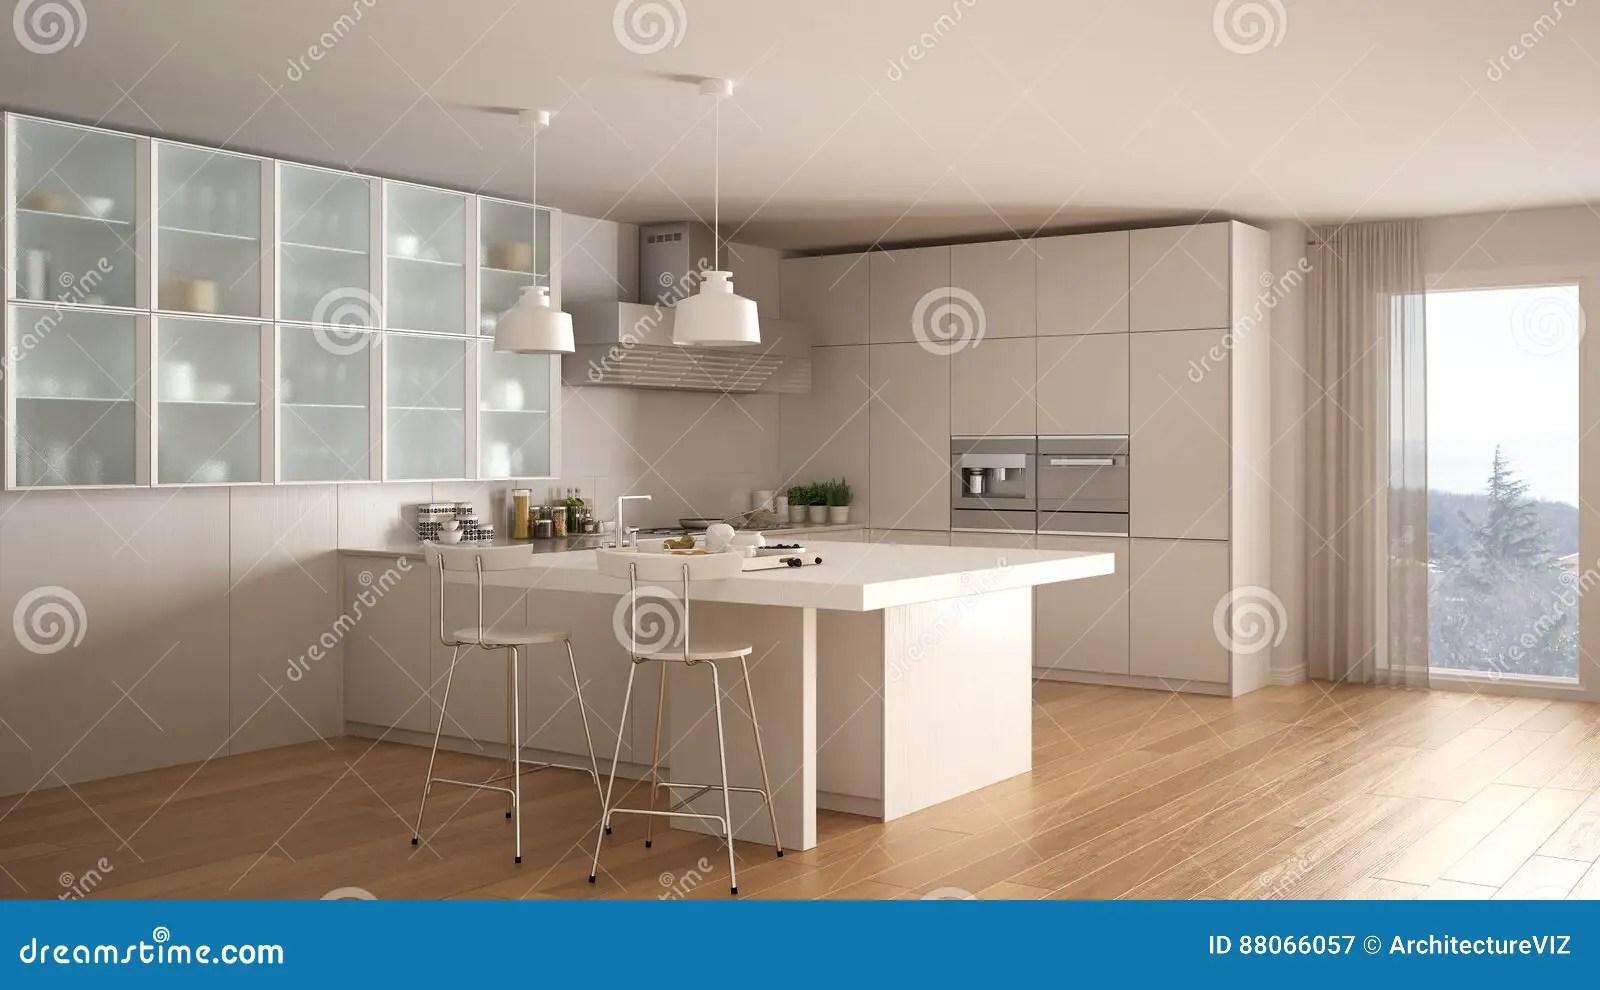 white kitchen floor grey chairs 有镶花地板的 现代interio经典最小的白色厨房库存例证 插画包括有消耗 现代interio经典最小的白色厨房